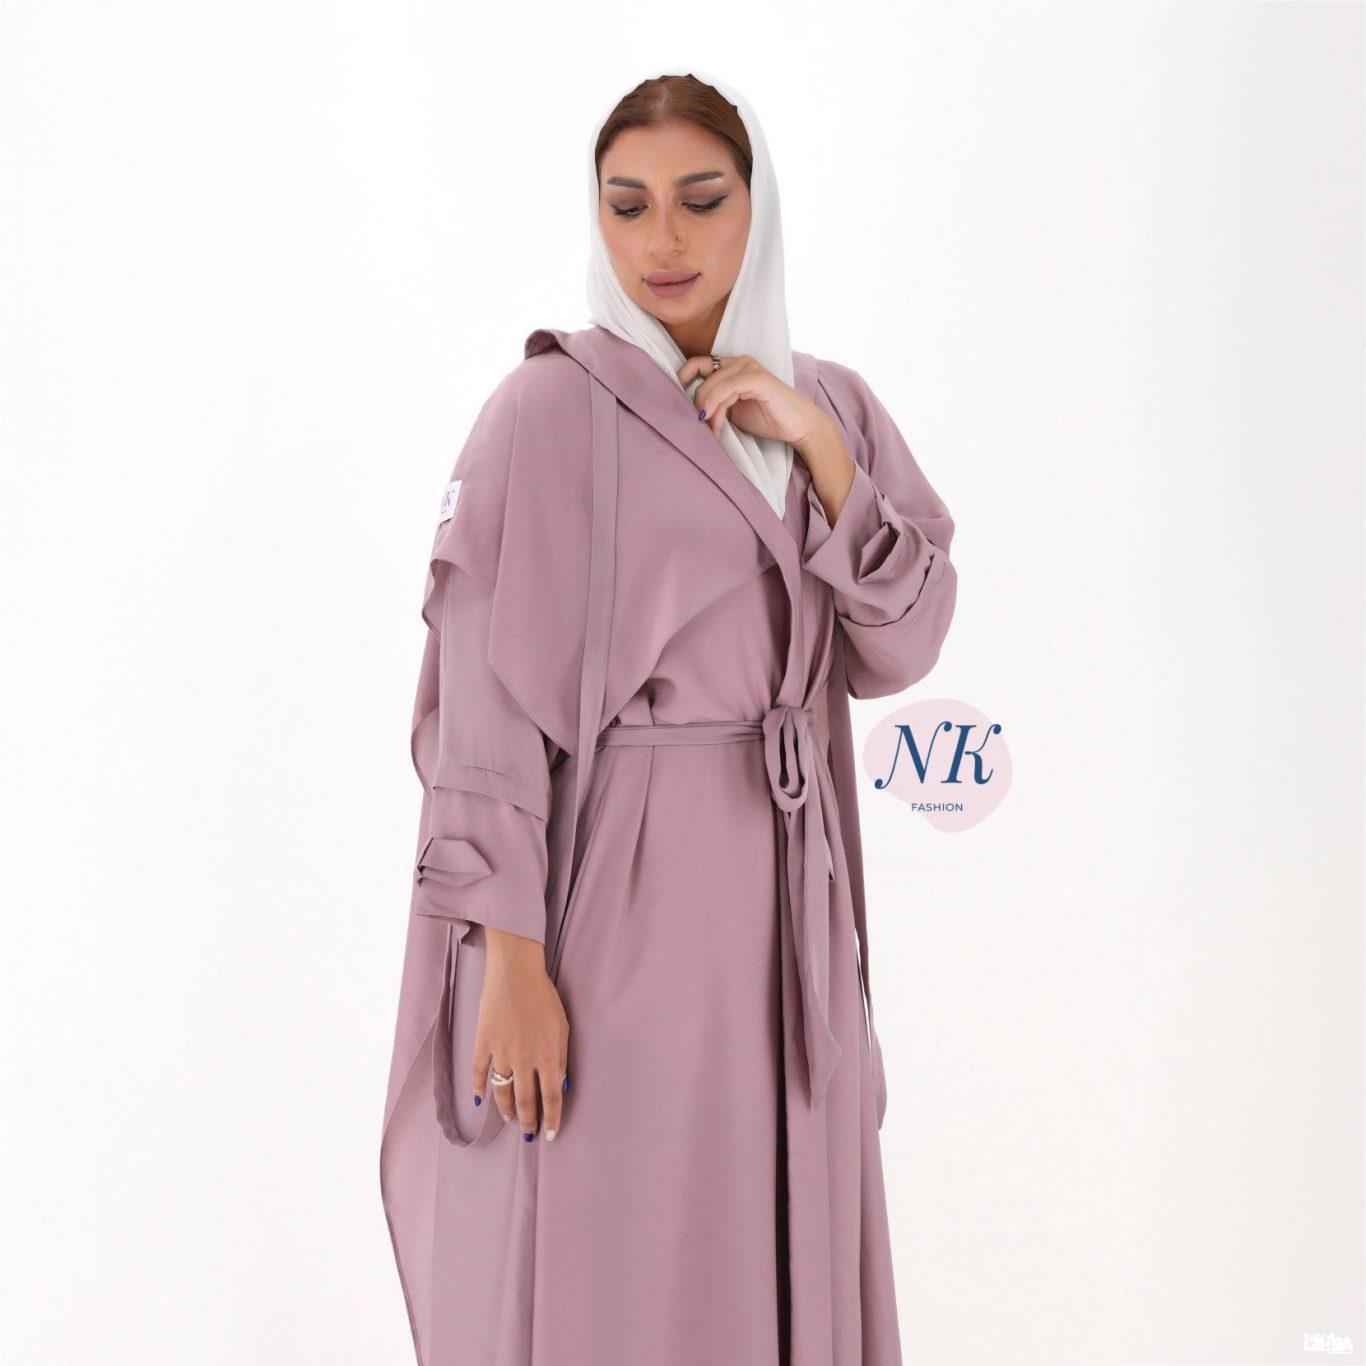 Pink Abaya with White Scarf